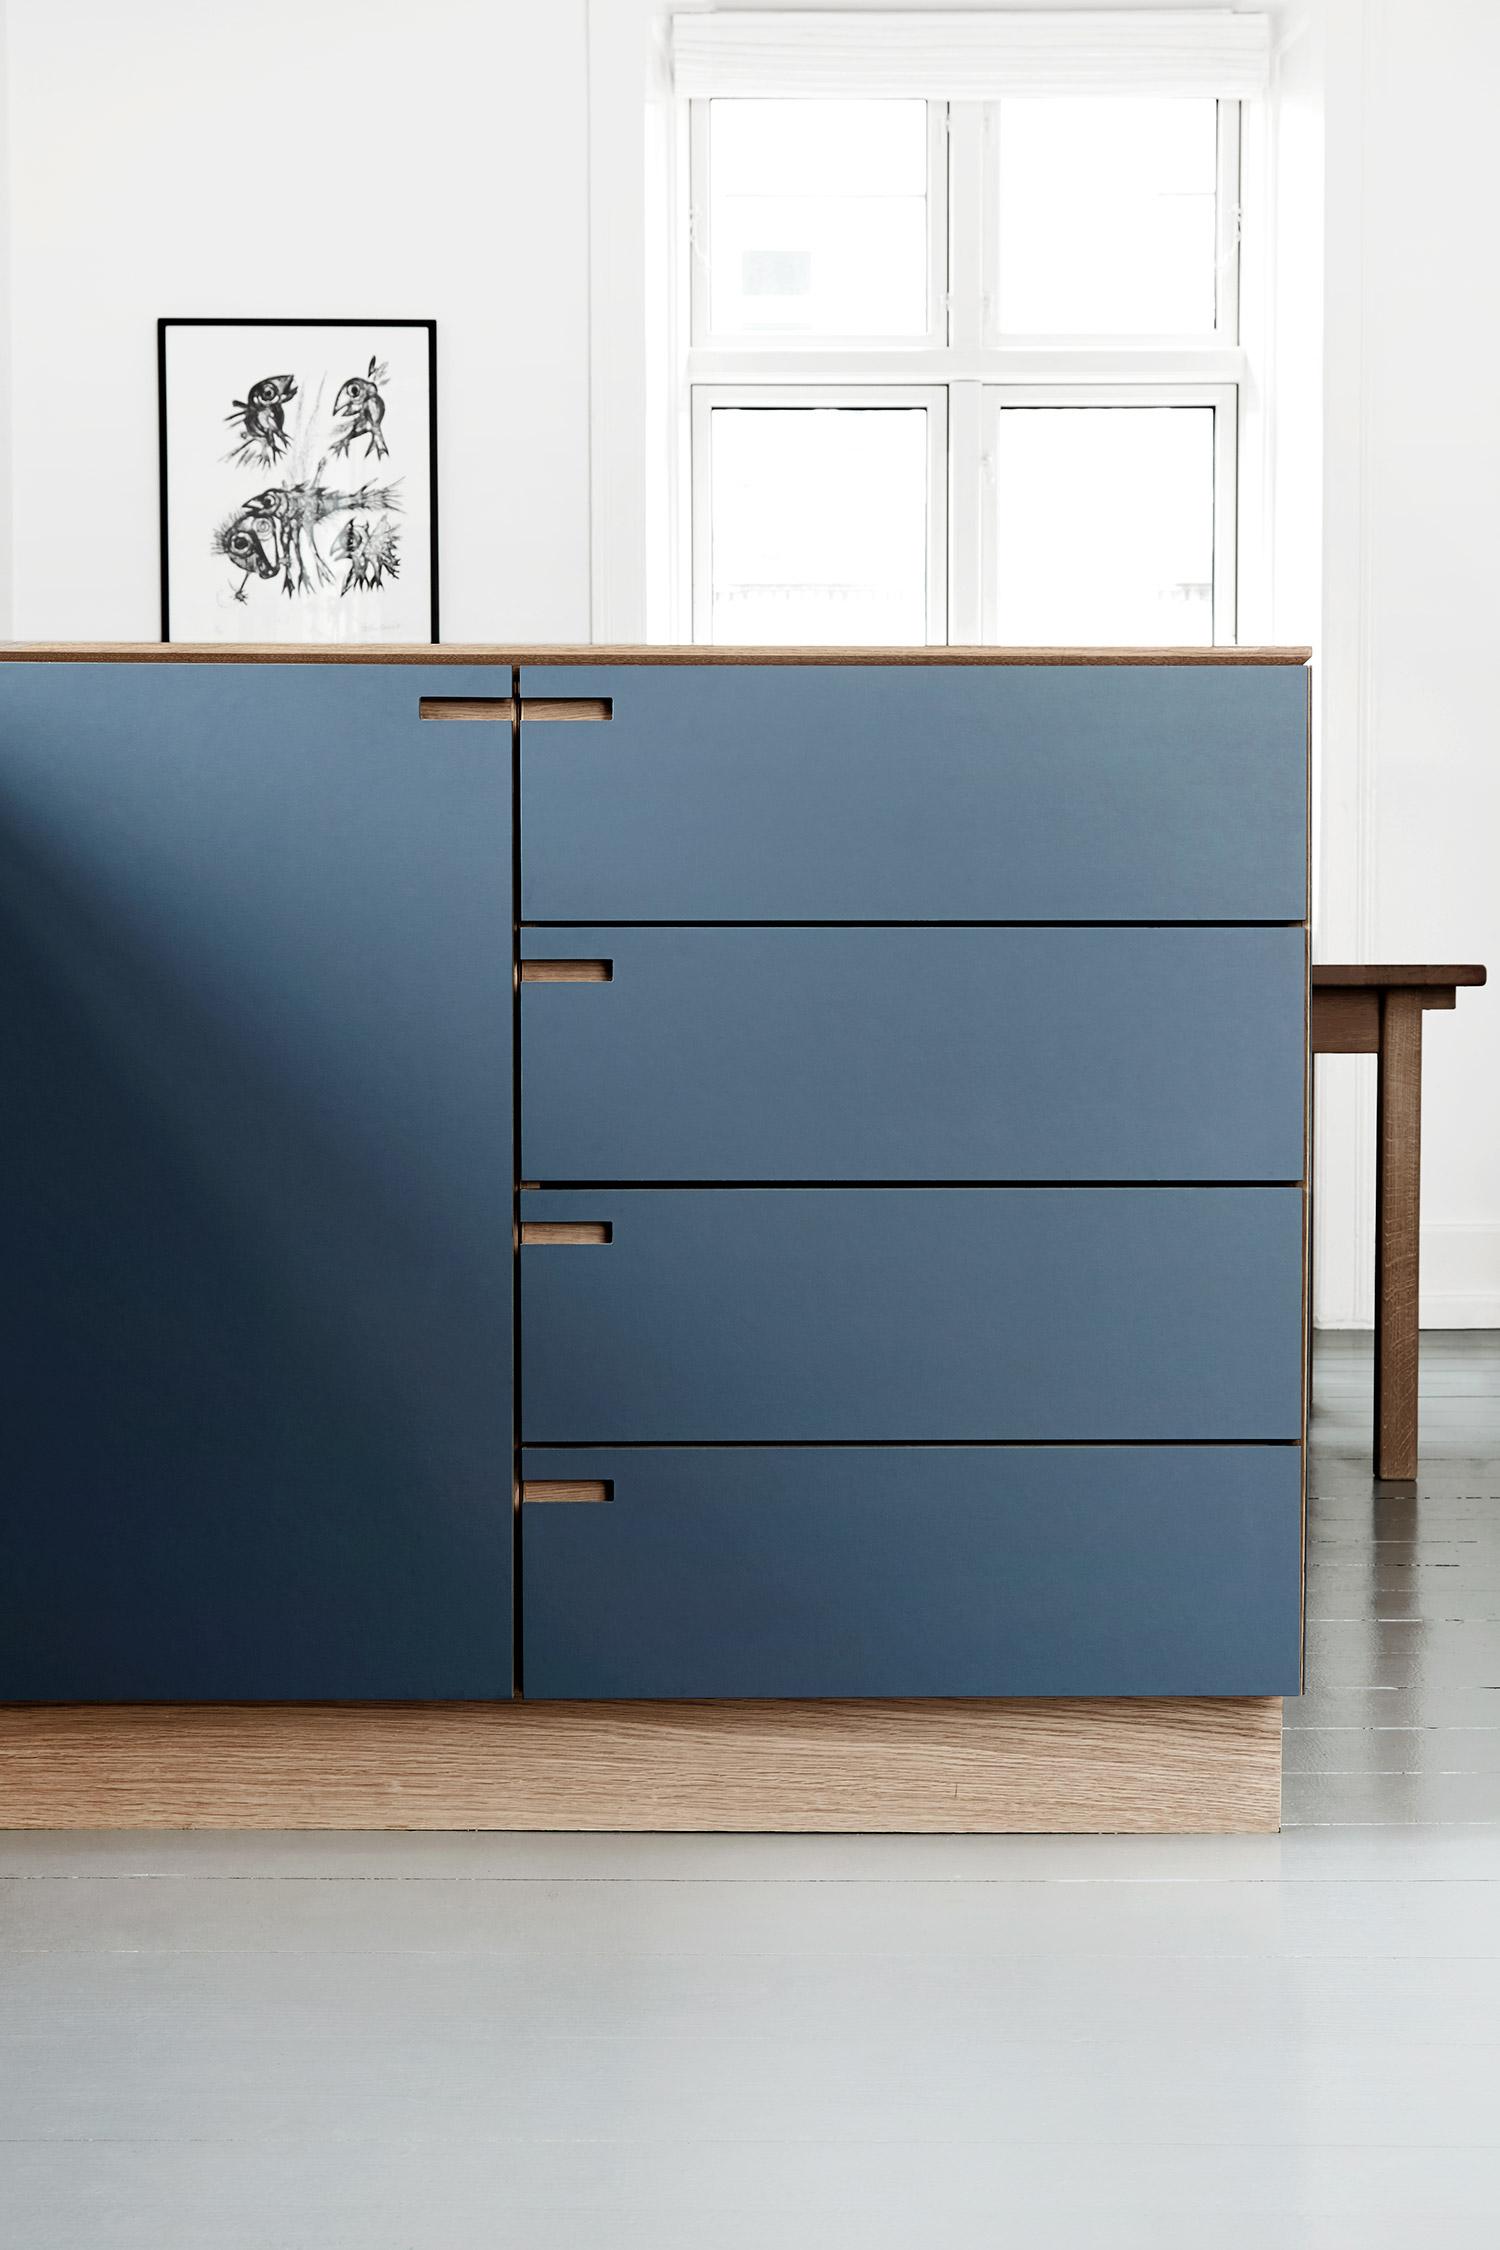 Kitchen design by Nicolaj Bo, Copenhagen, Denmark